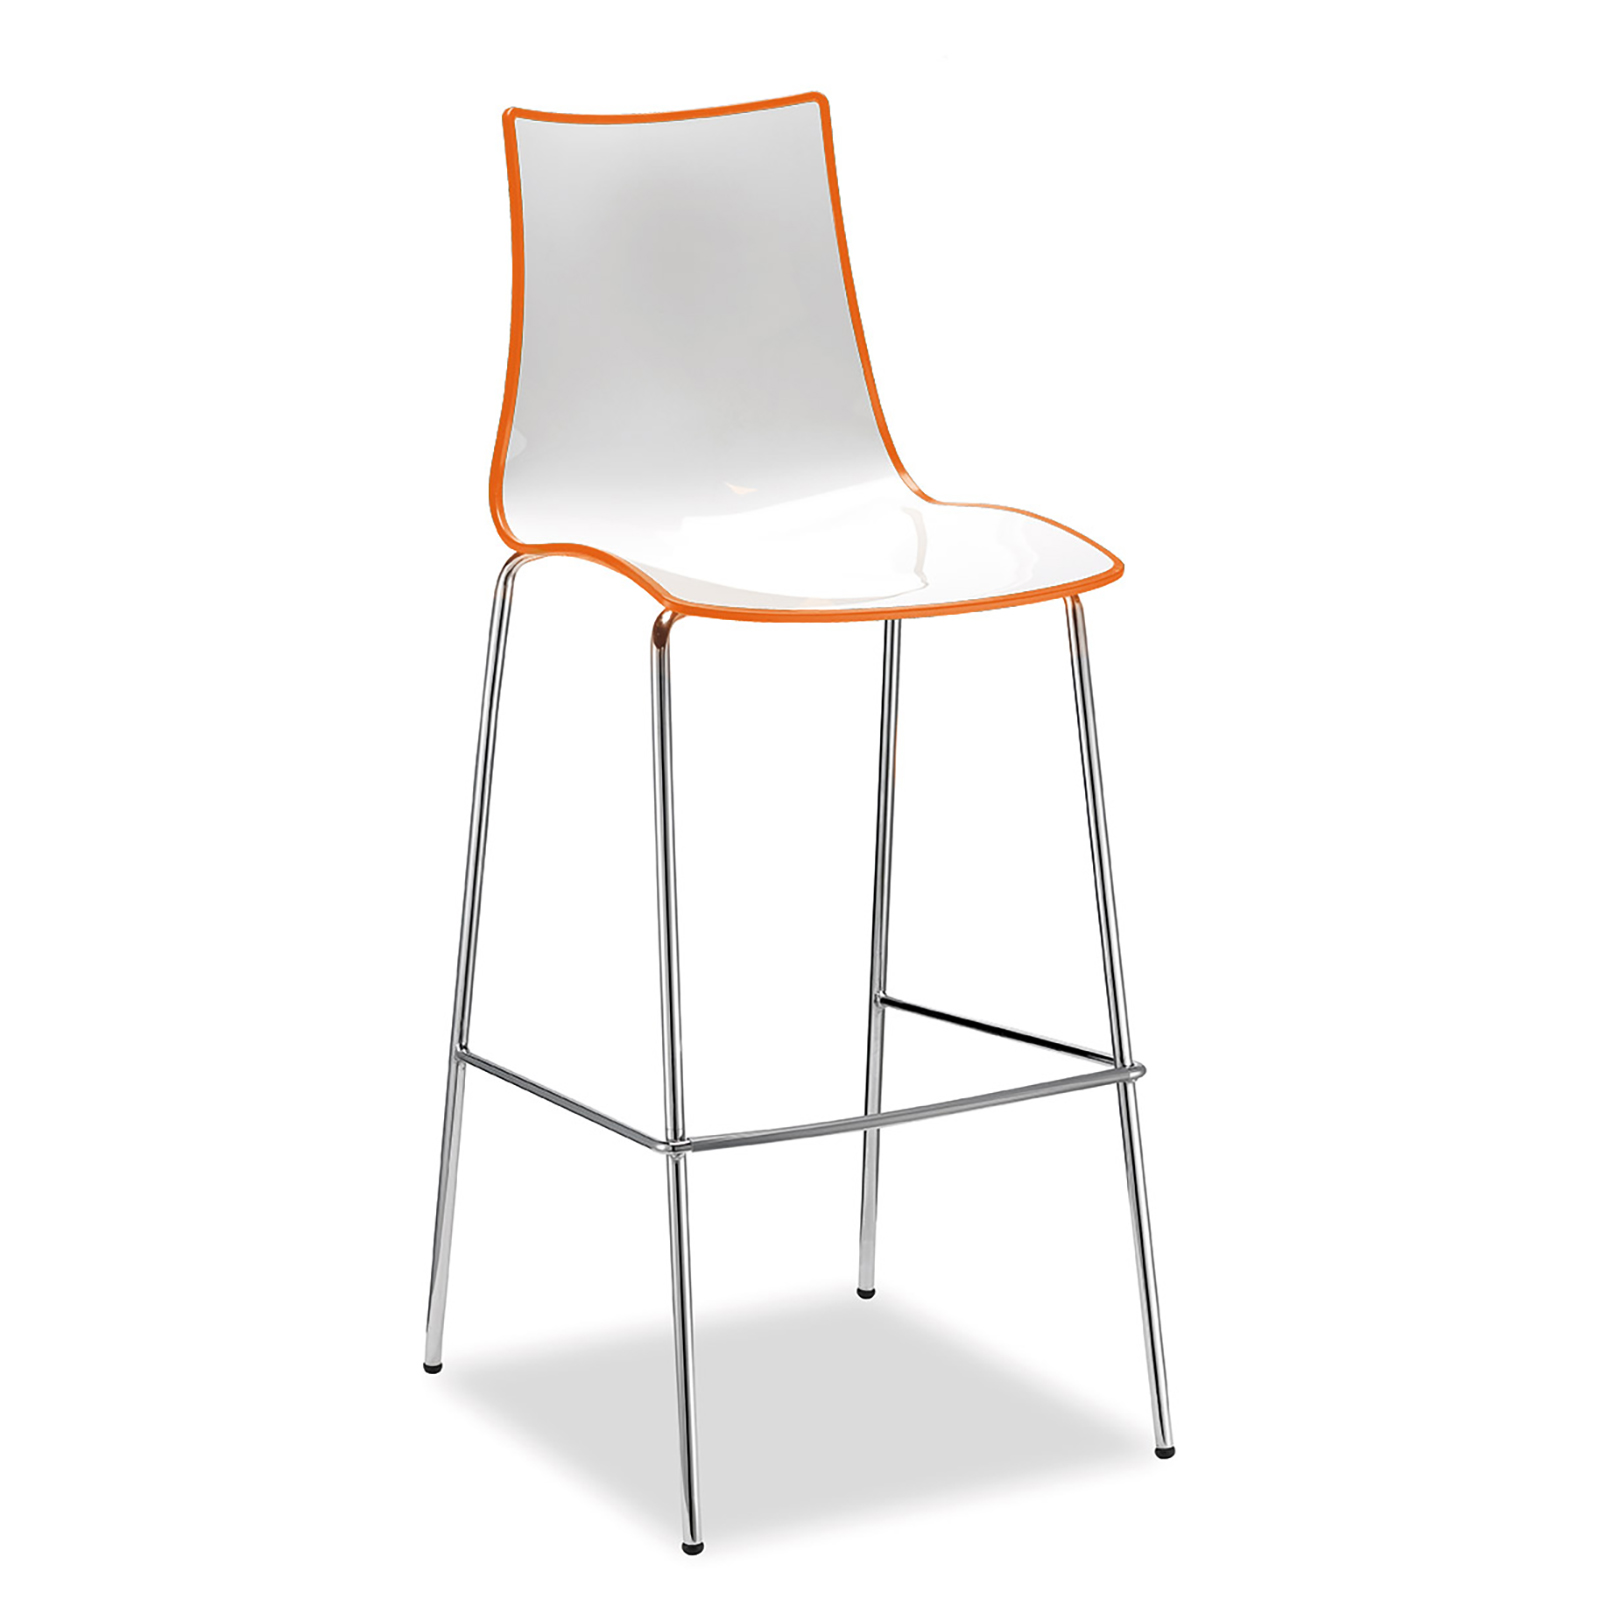 Gecko shell dining stool with chrome legs - orange